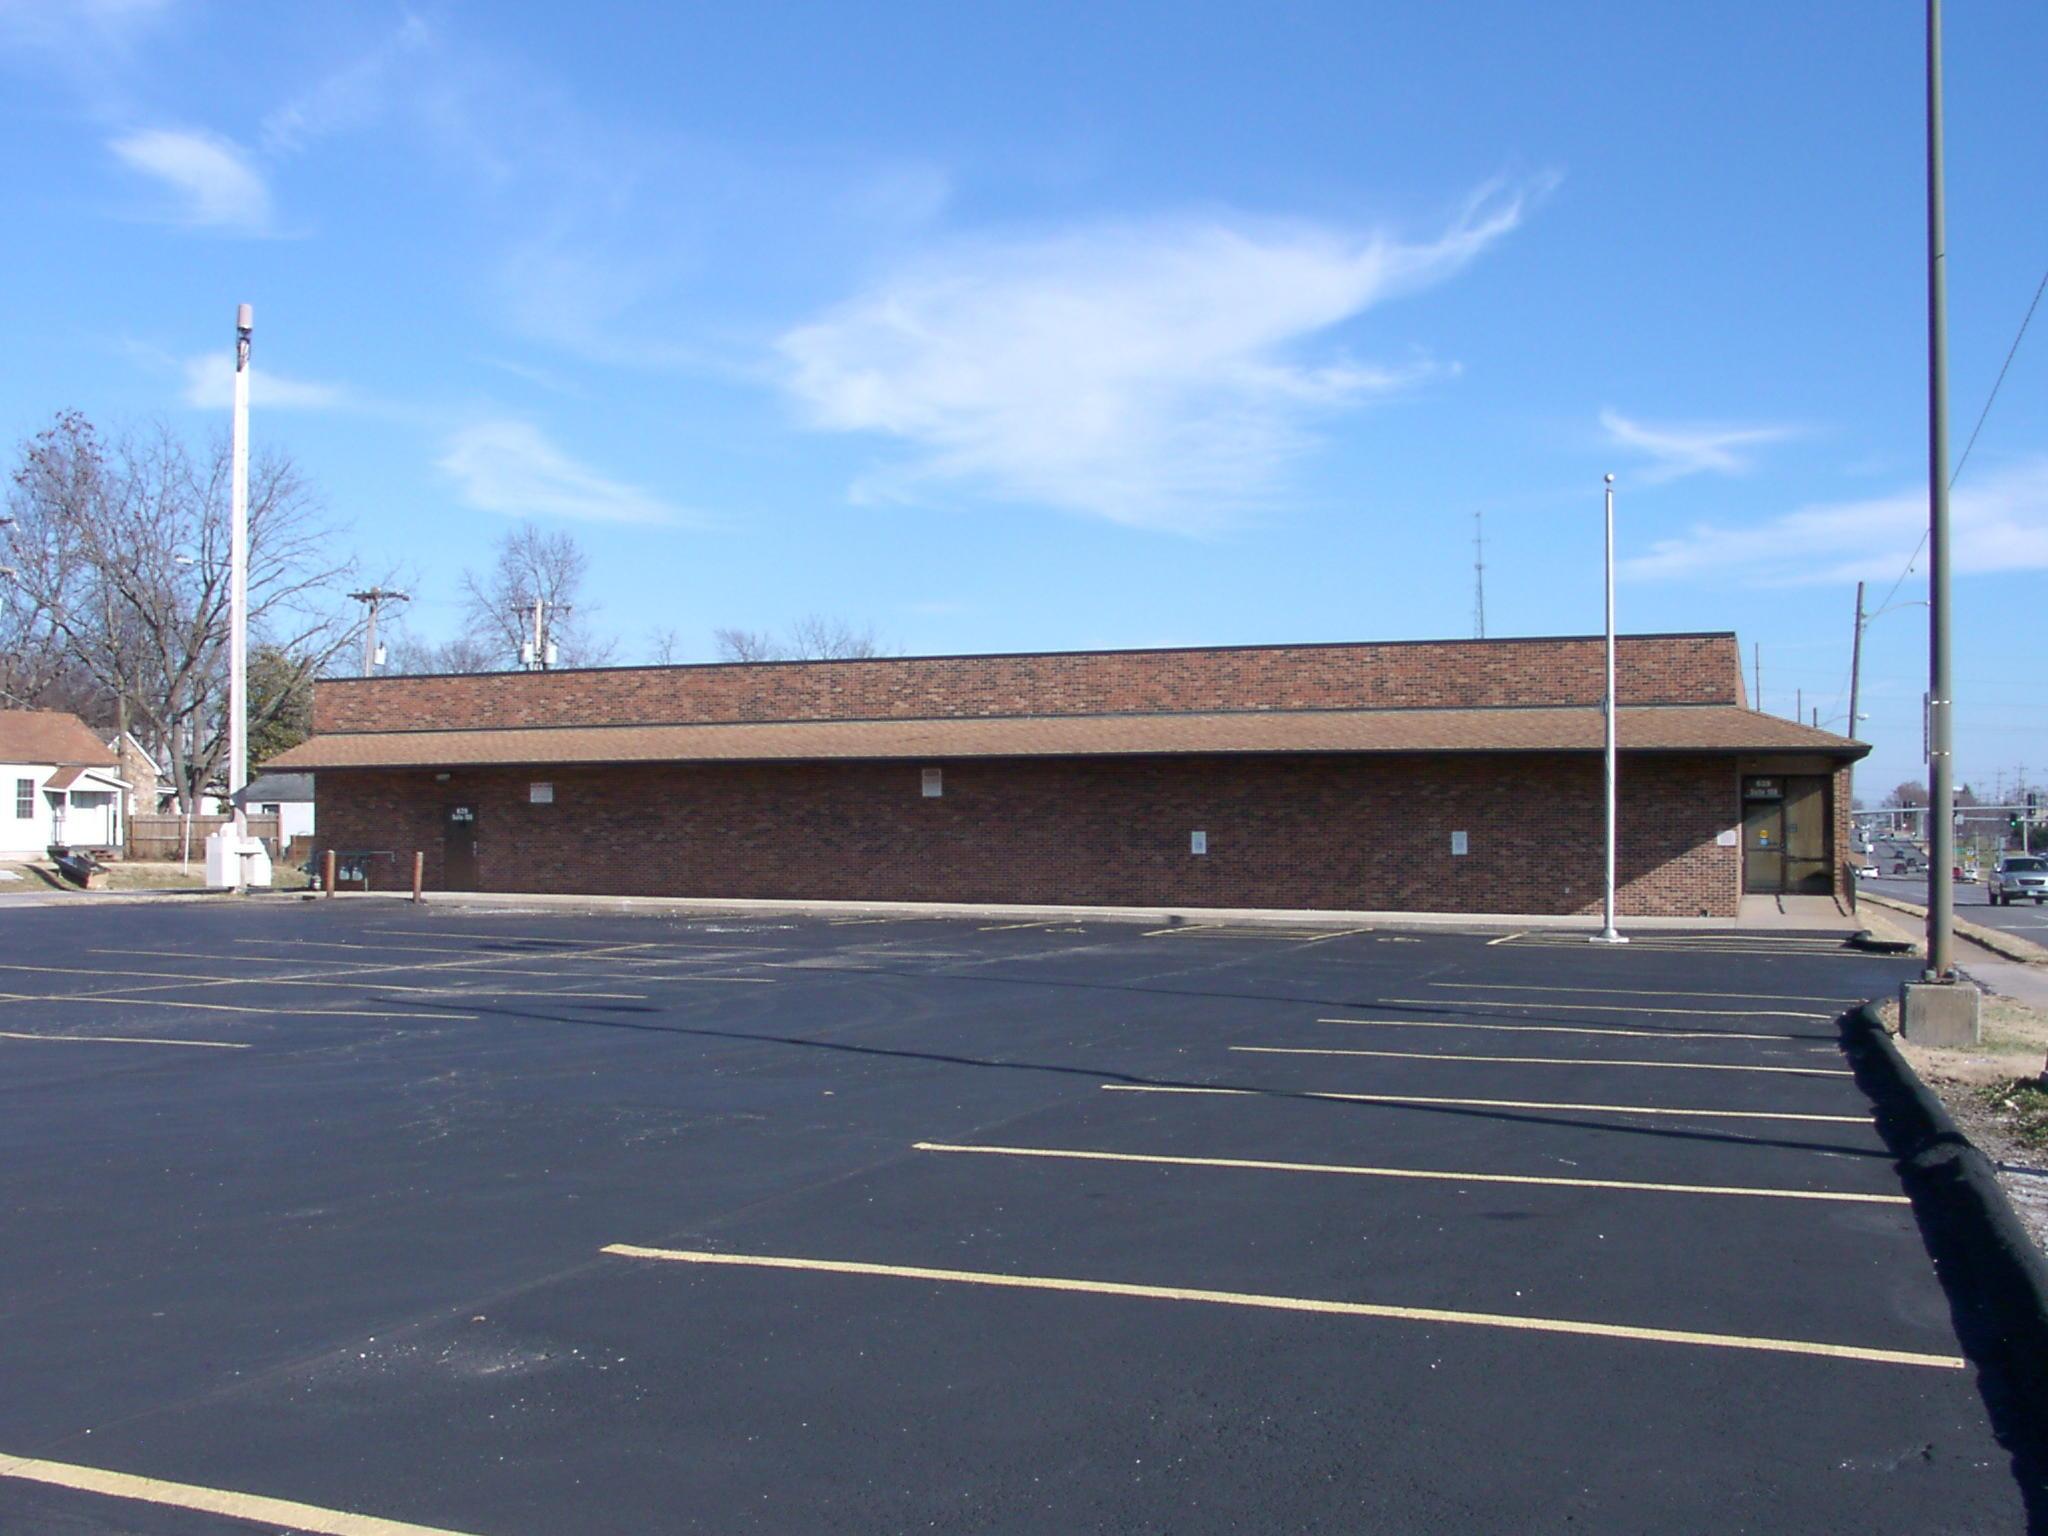 639 West Chestnut Expressway #108 Springfield, MO 65802